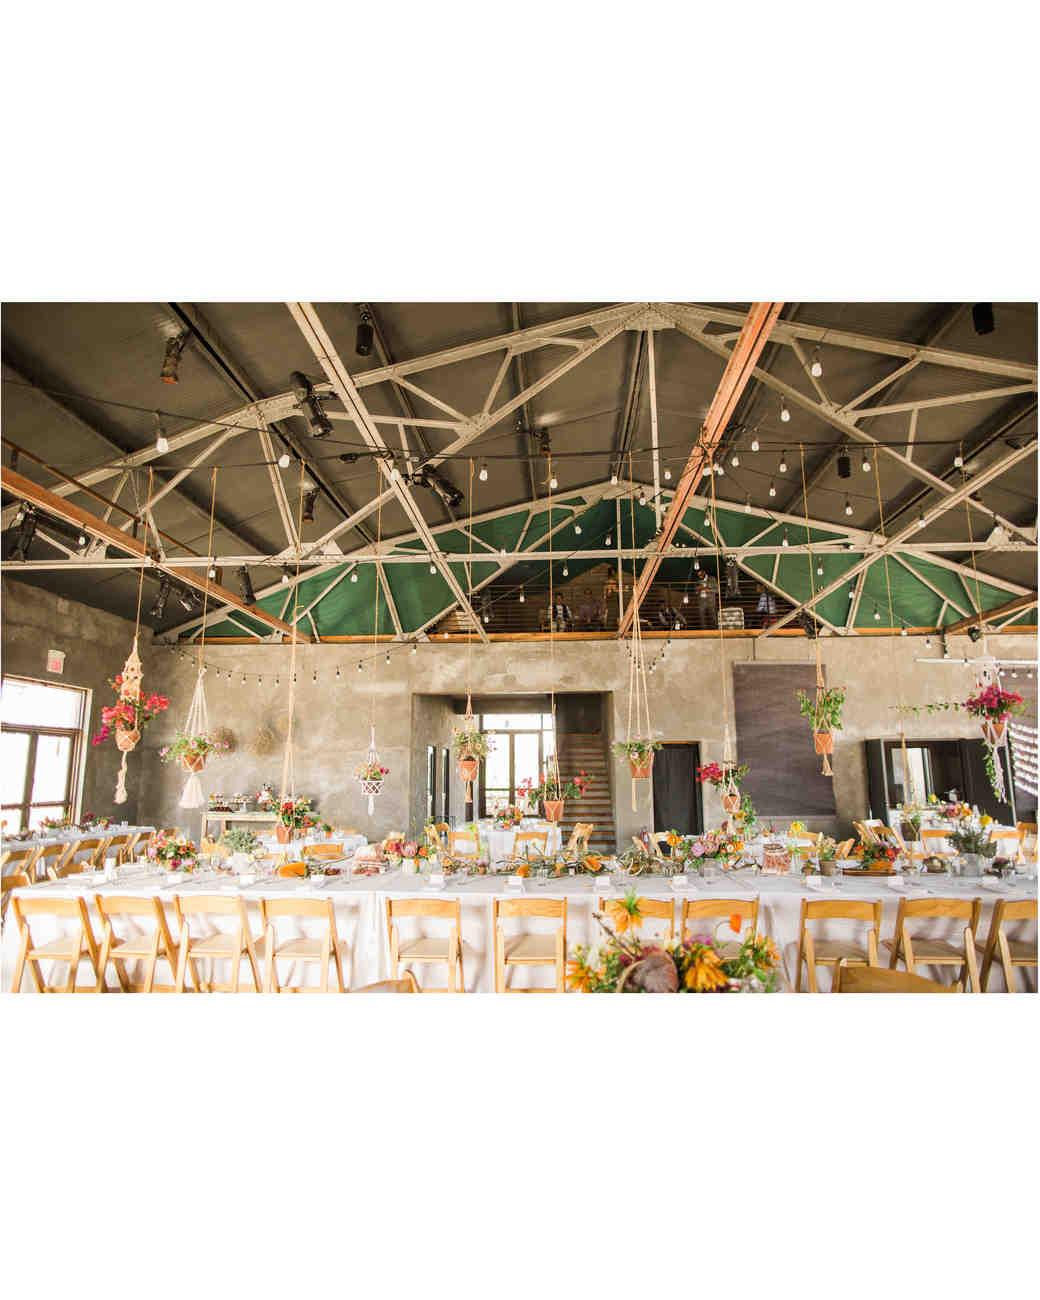 lara-chad-wedding-room-263-s112306-1115.jpg